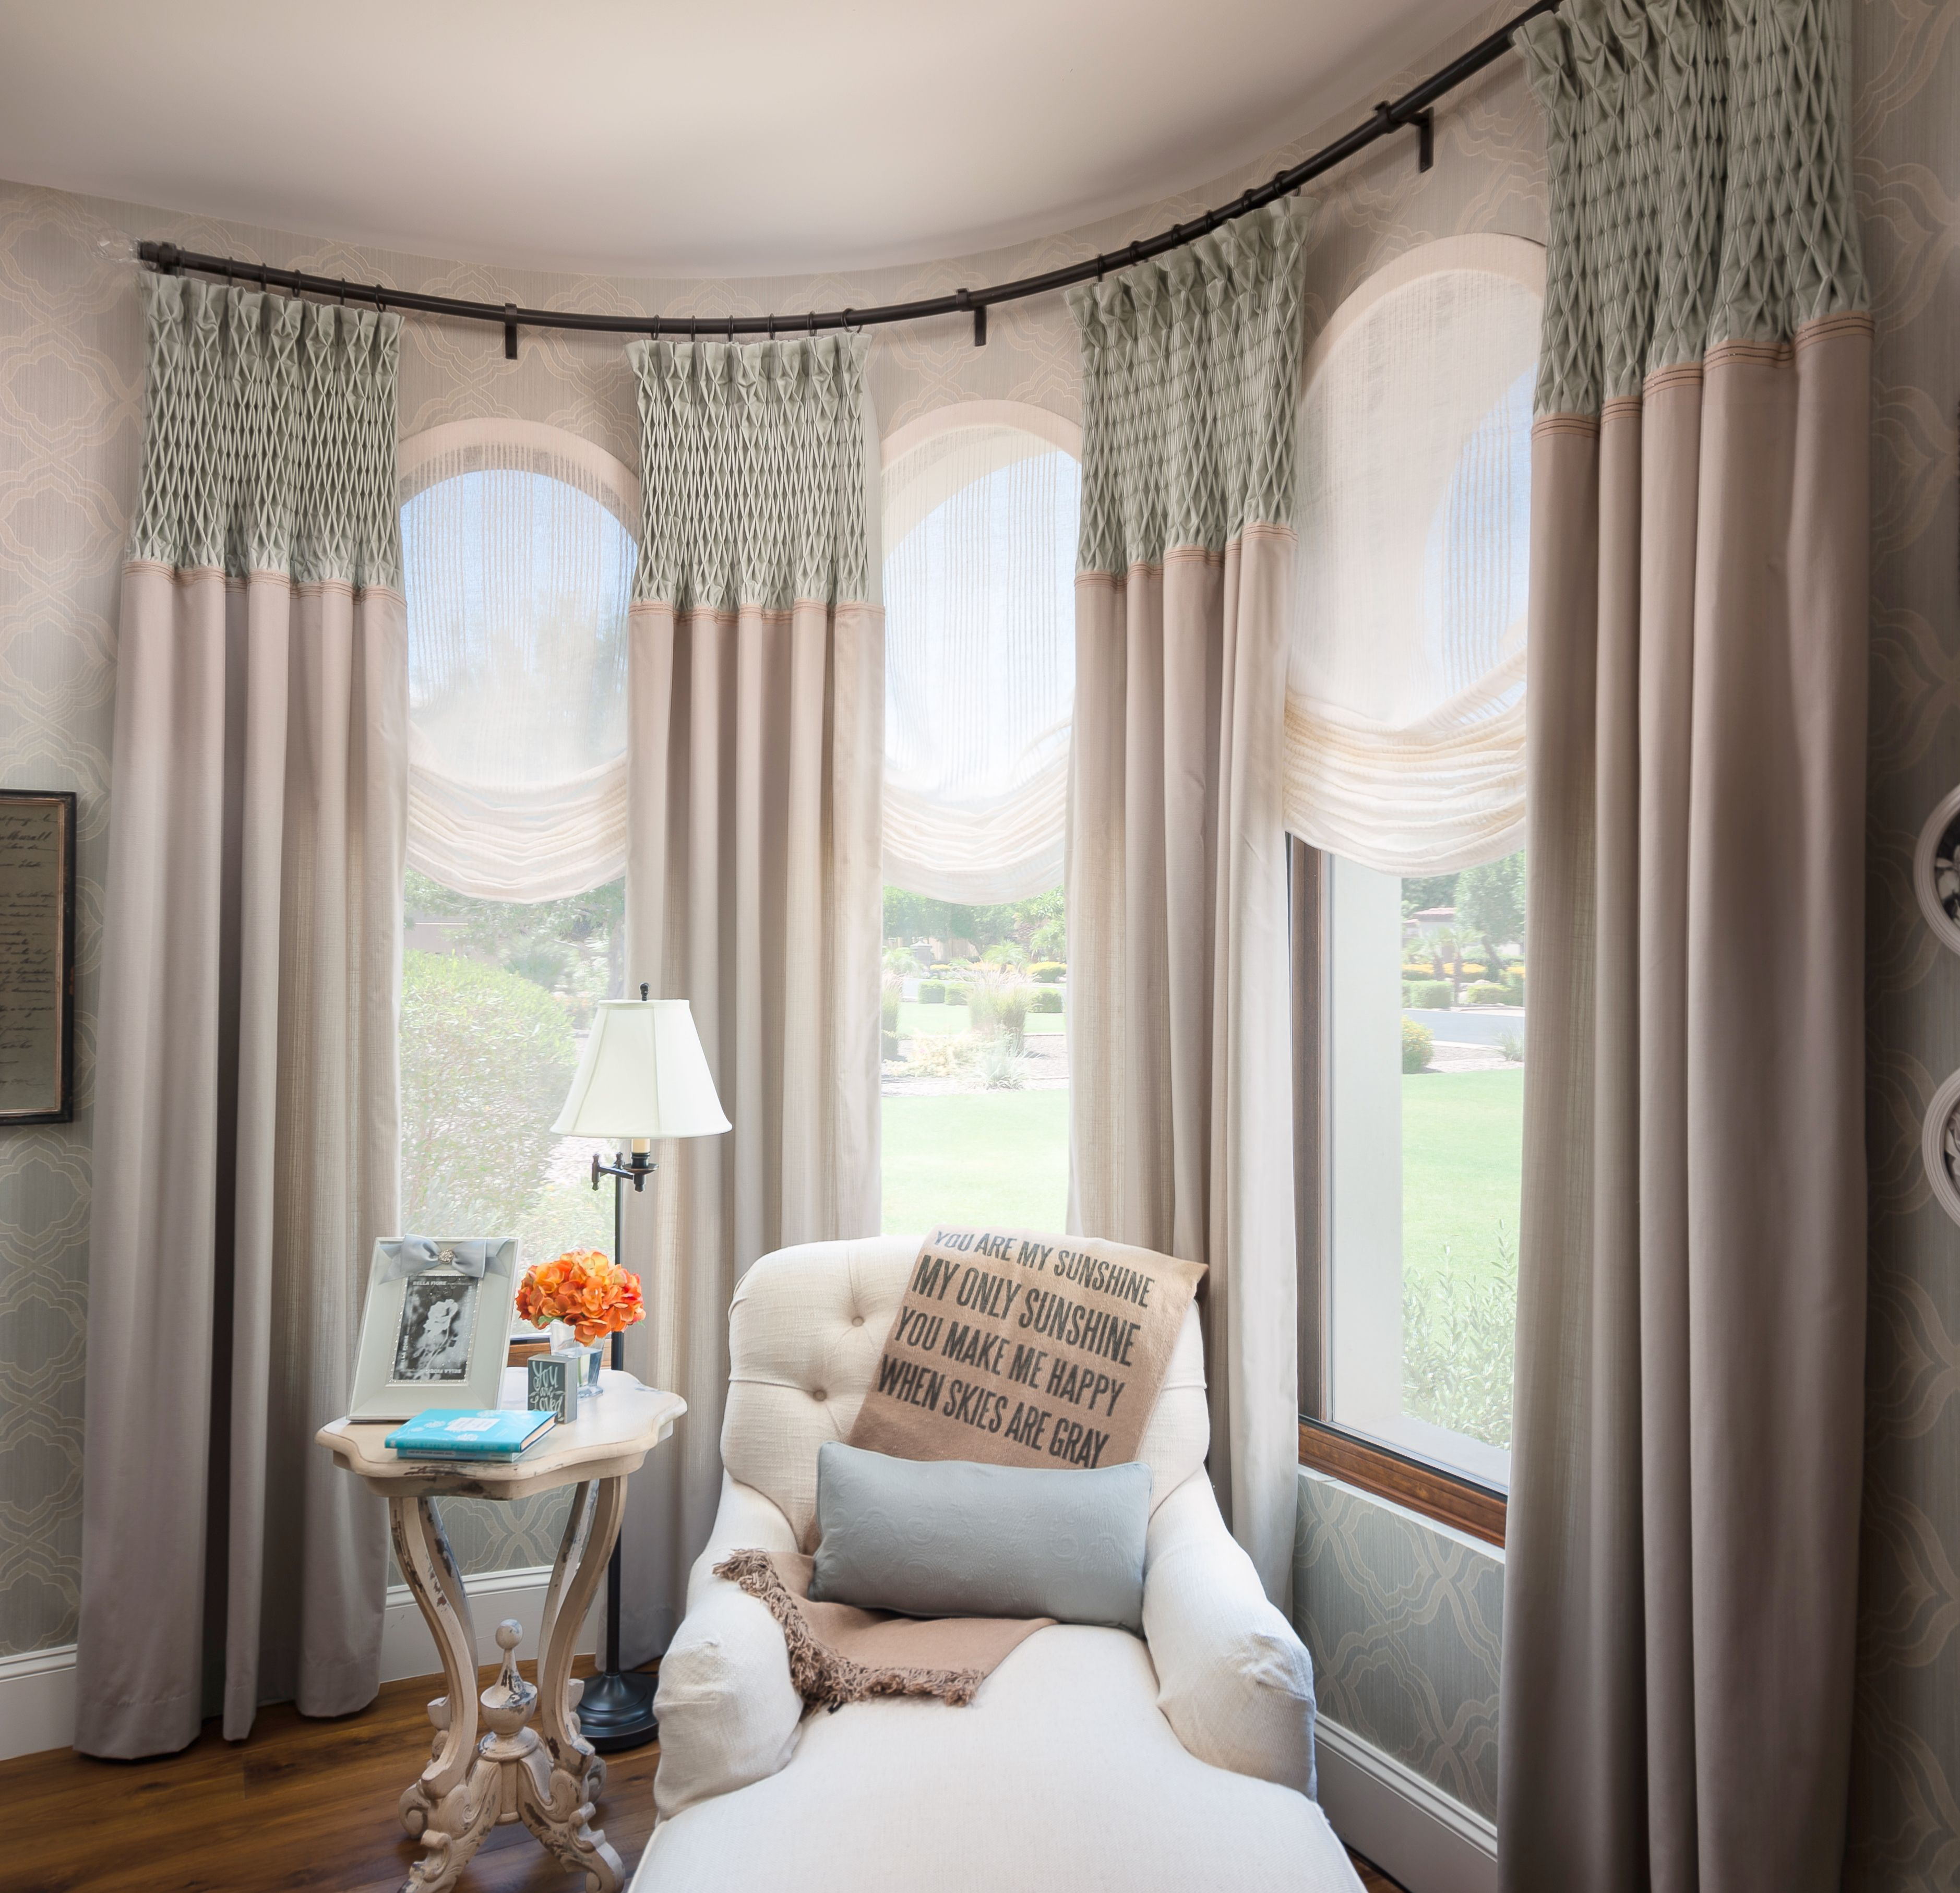 Window treatment ideas for arched windows  workroom specialty windows karen barnes the elegant window